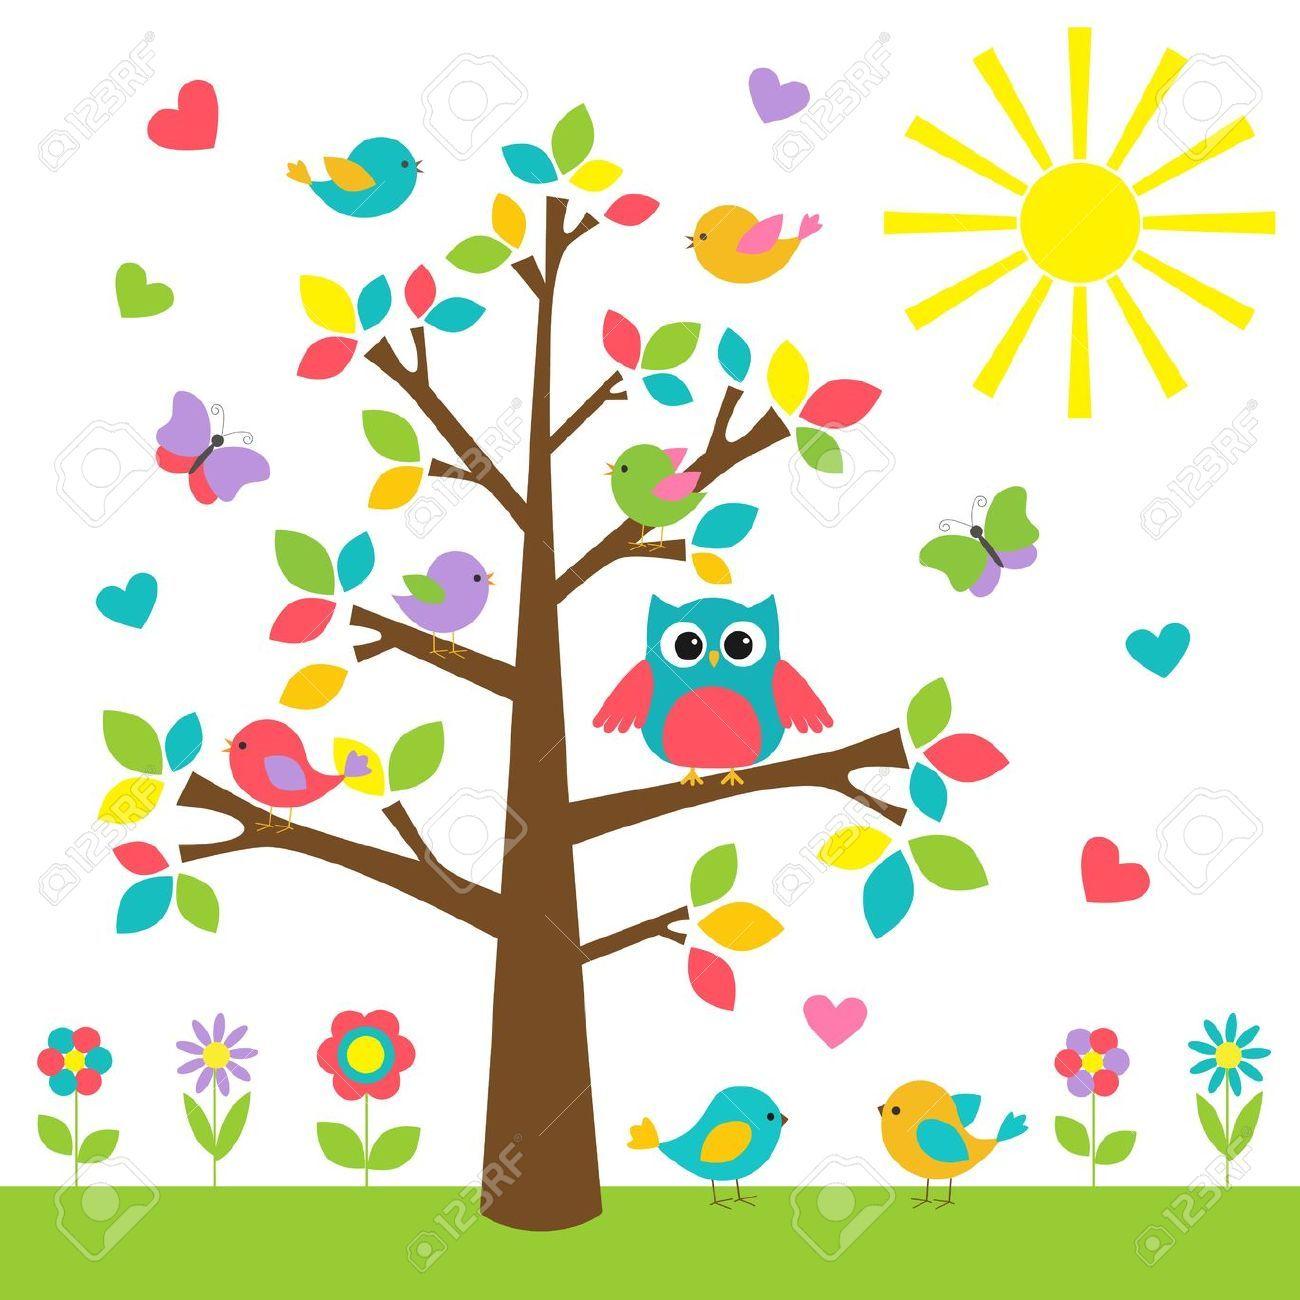 Dibujos arboles decorativos buscar con google for Pegatinas pared arbol infantil